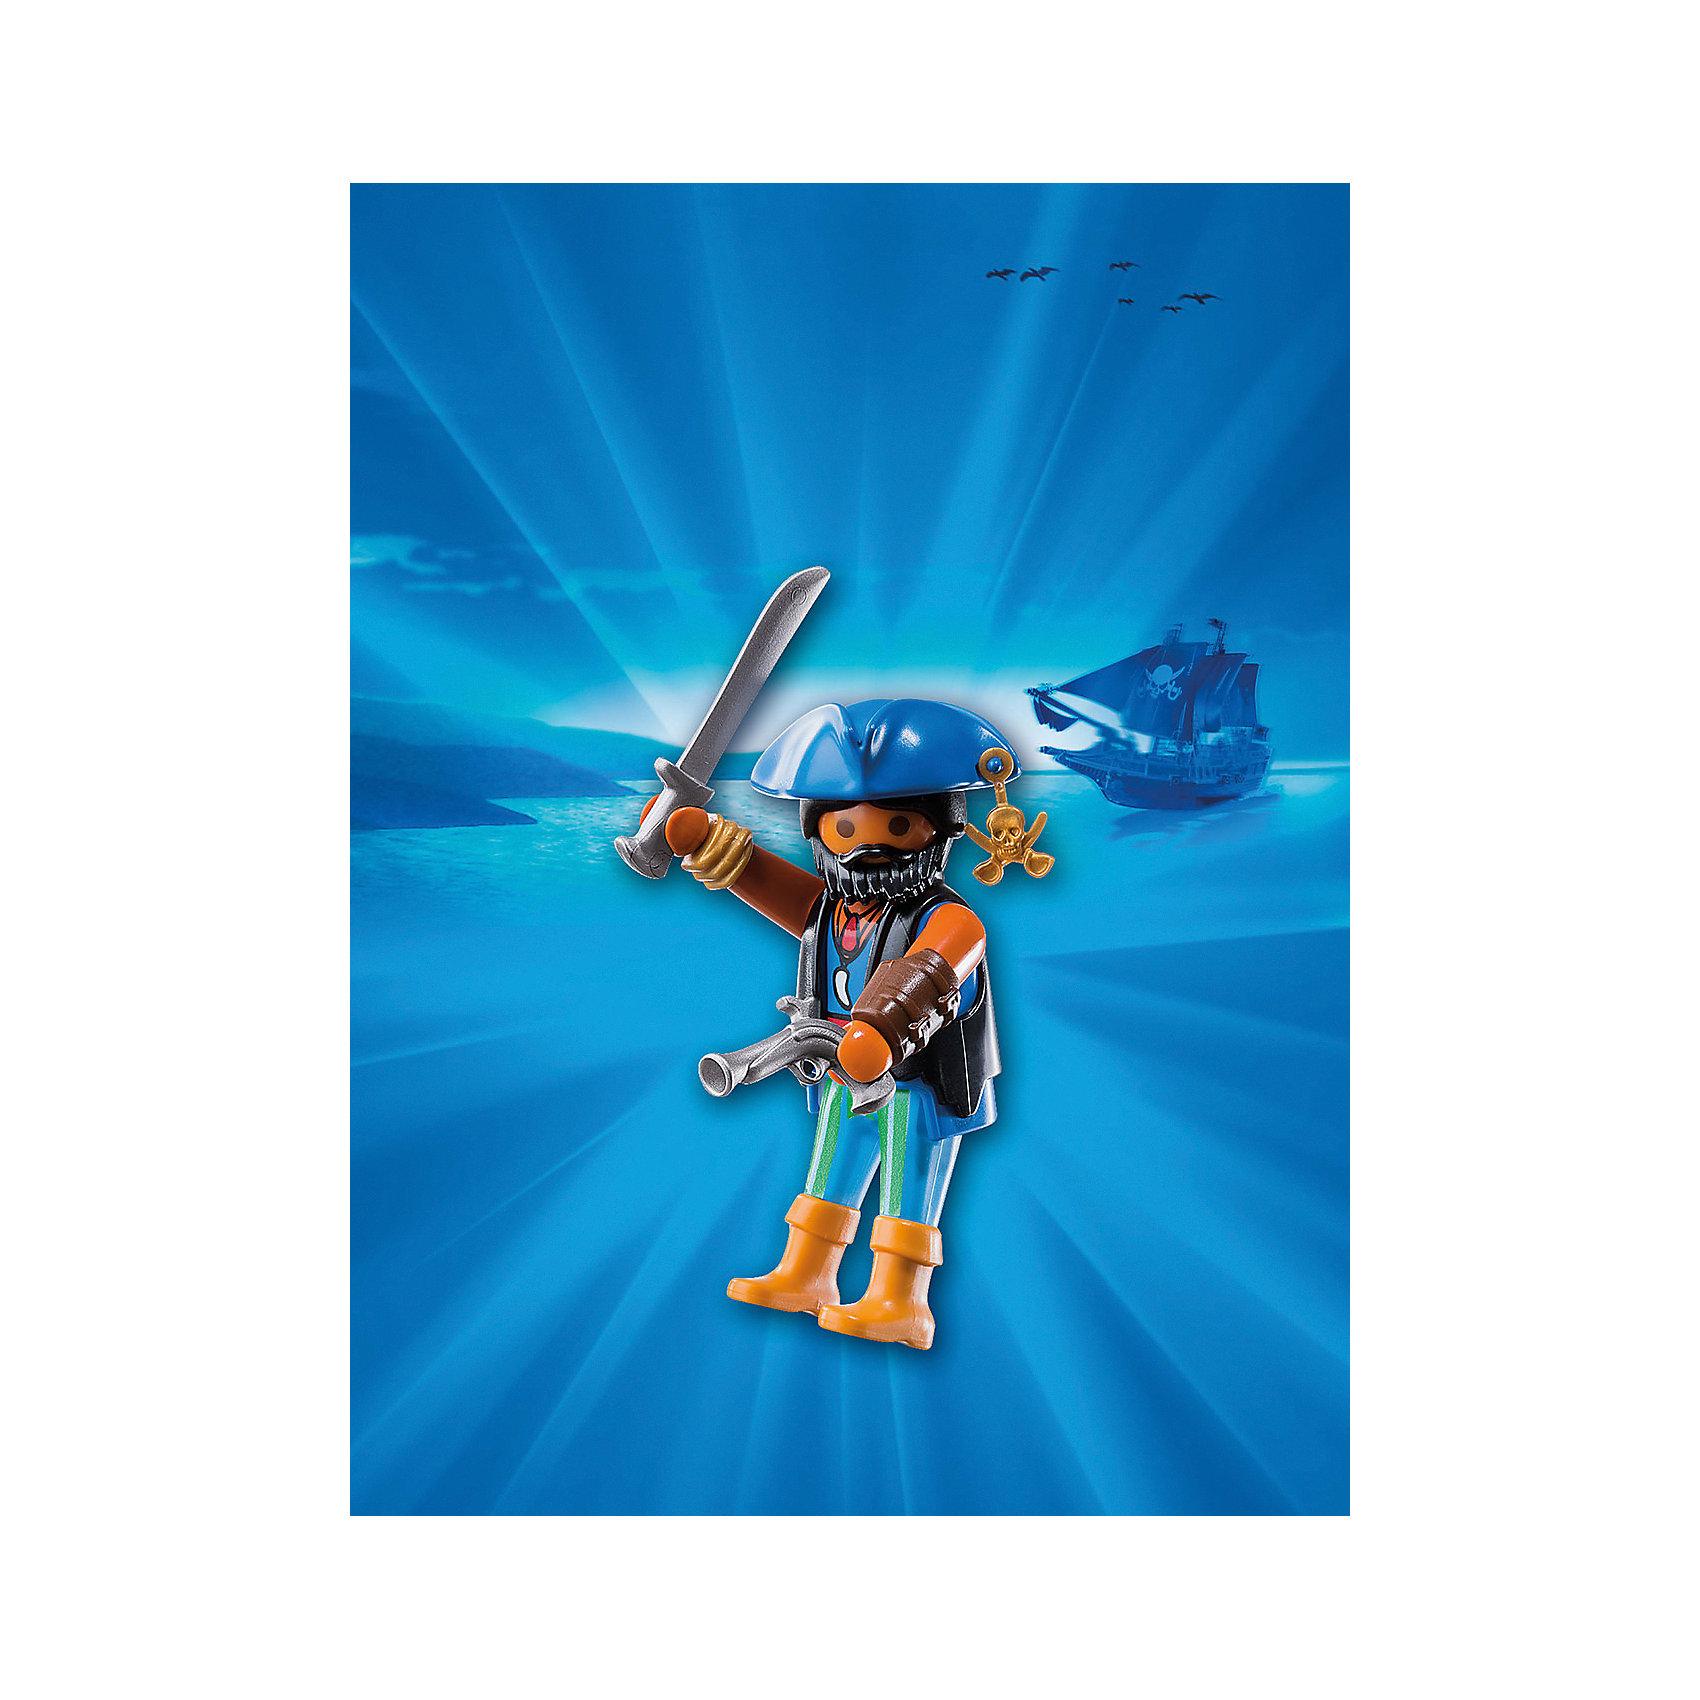 PLAYMOBIL® Друзья: Пираты Карибского моря, PLAYMOBIL playmobil® playmobil 5546 парк развлечений продавец шаров smileyworld